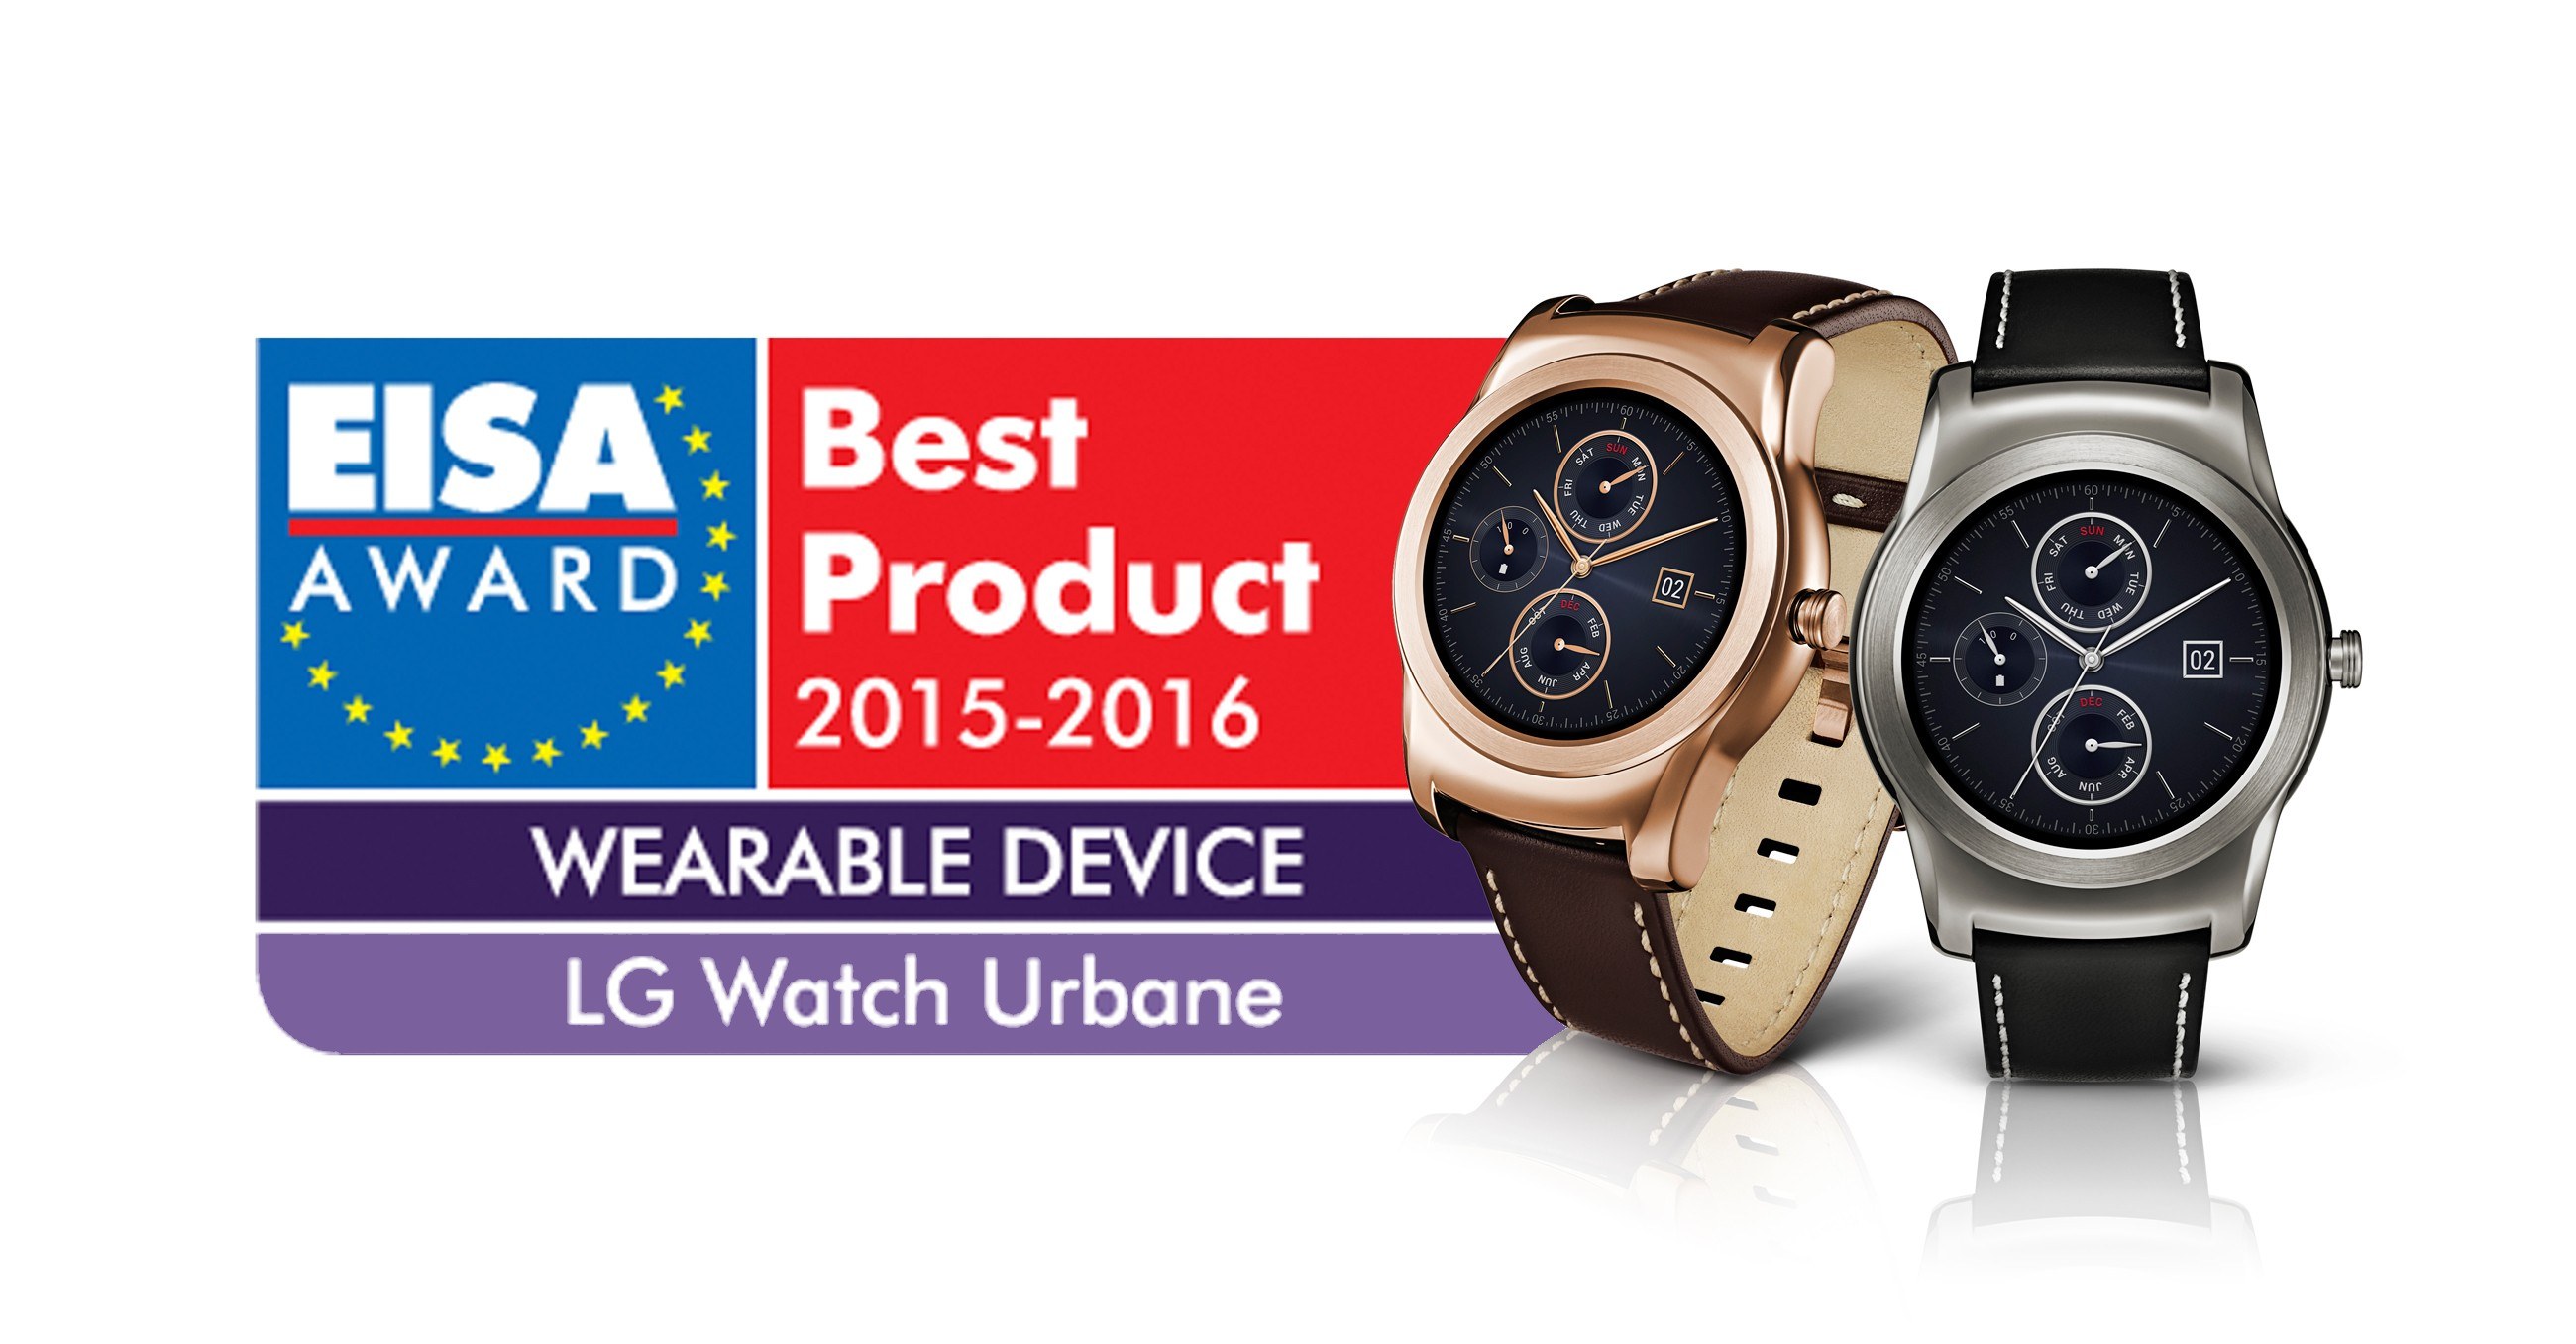 LG Watch Urbane become the European Wearable Device award winner.